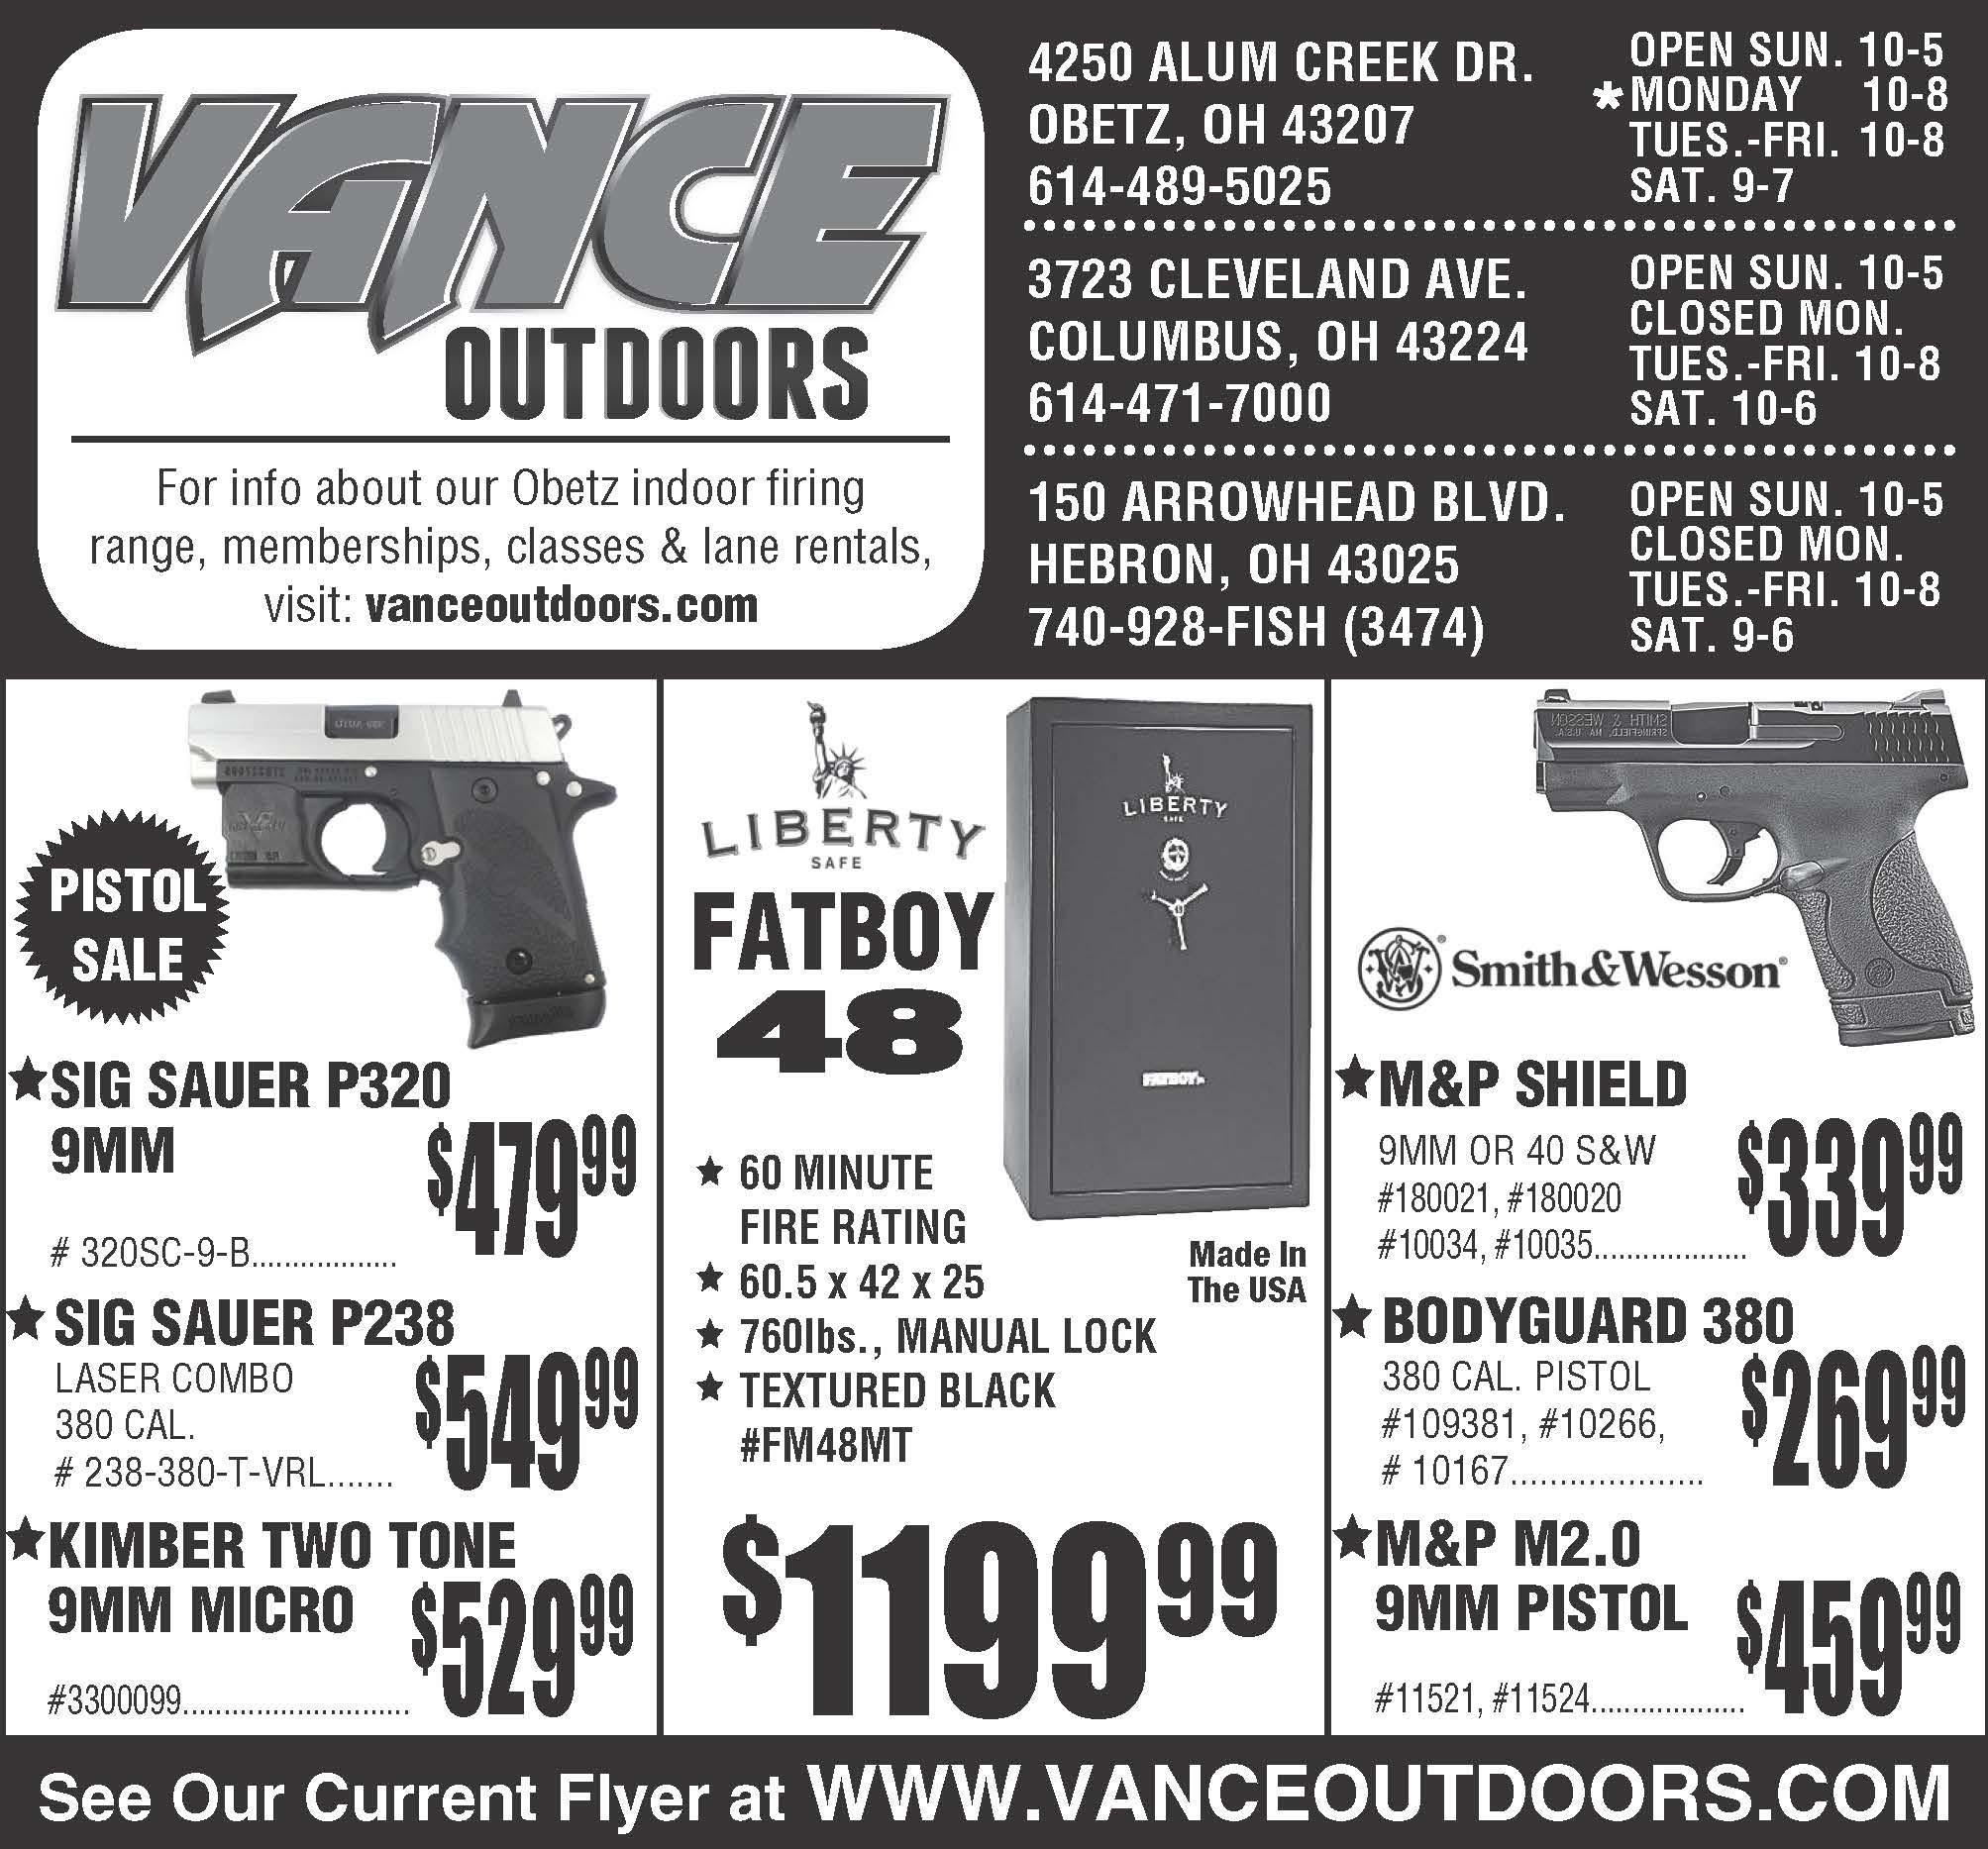 Vance's Weekly Ad Insert: Sunday, February 12, 2017